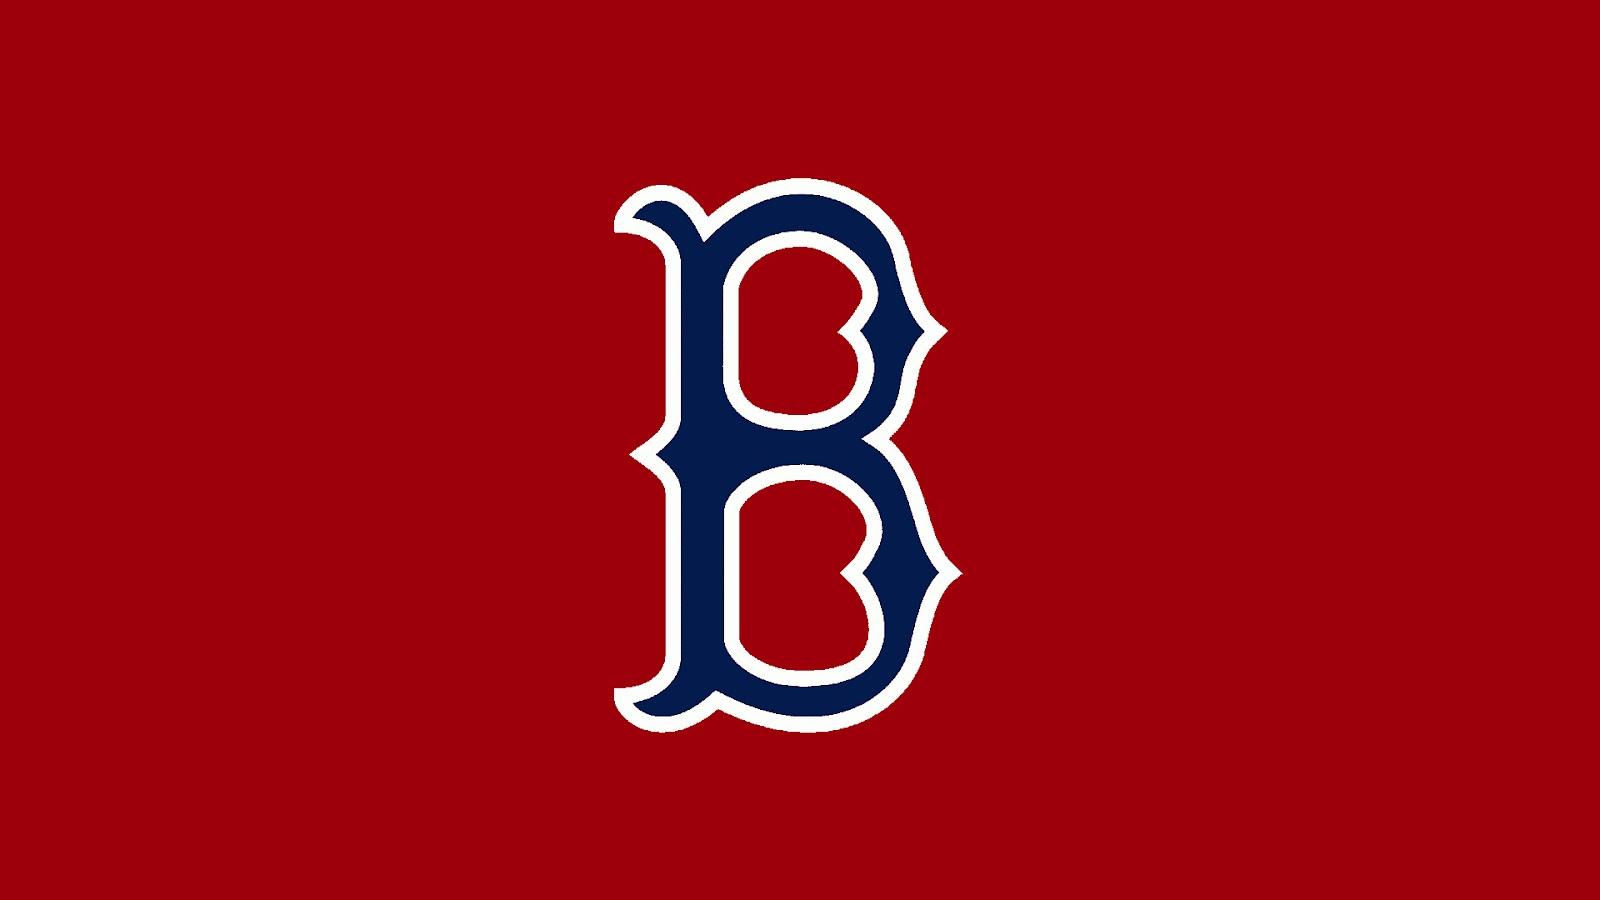 http://1.bp.blogspot.com/-c7AHlRpLjn8/T_zBVqSUg6I/AAAAAAAABYU/fdPnc6uMsv8/s1600/Boston-Red-Sox-Wallpaper-Logo.jpg